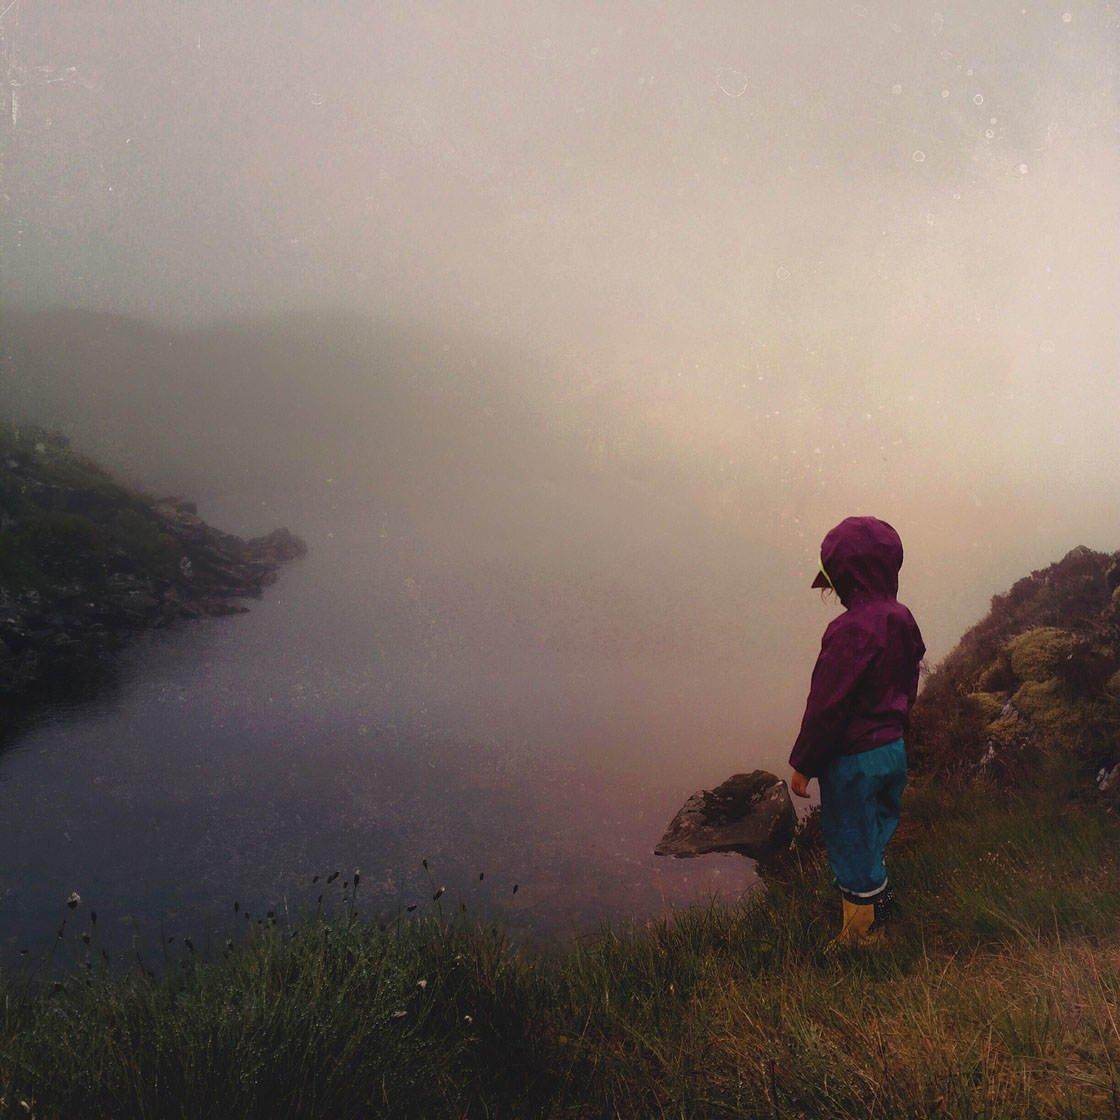 Fog & Mist iPhone Photos 37 no script